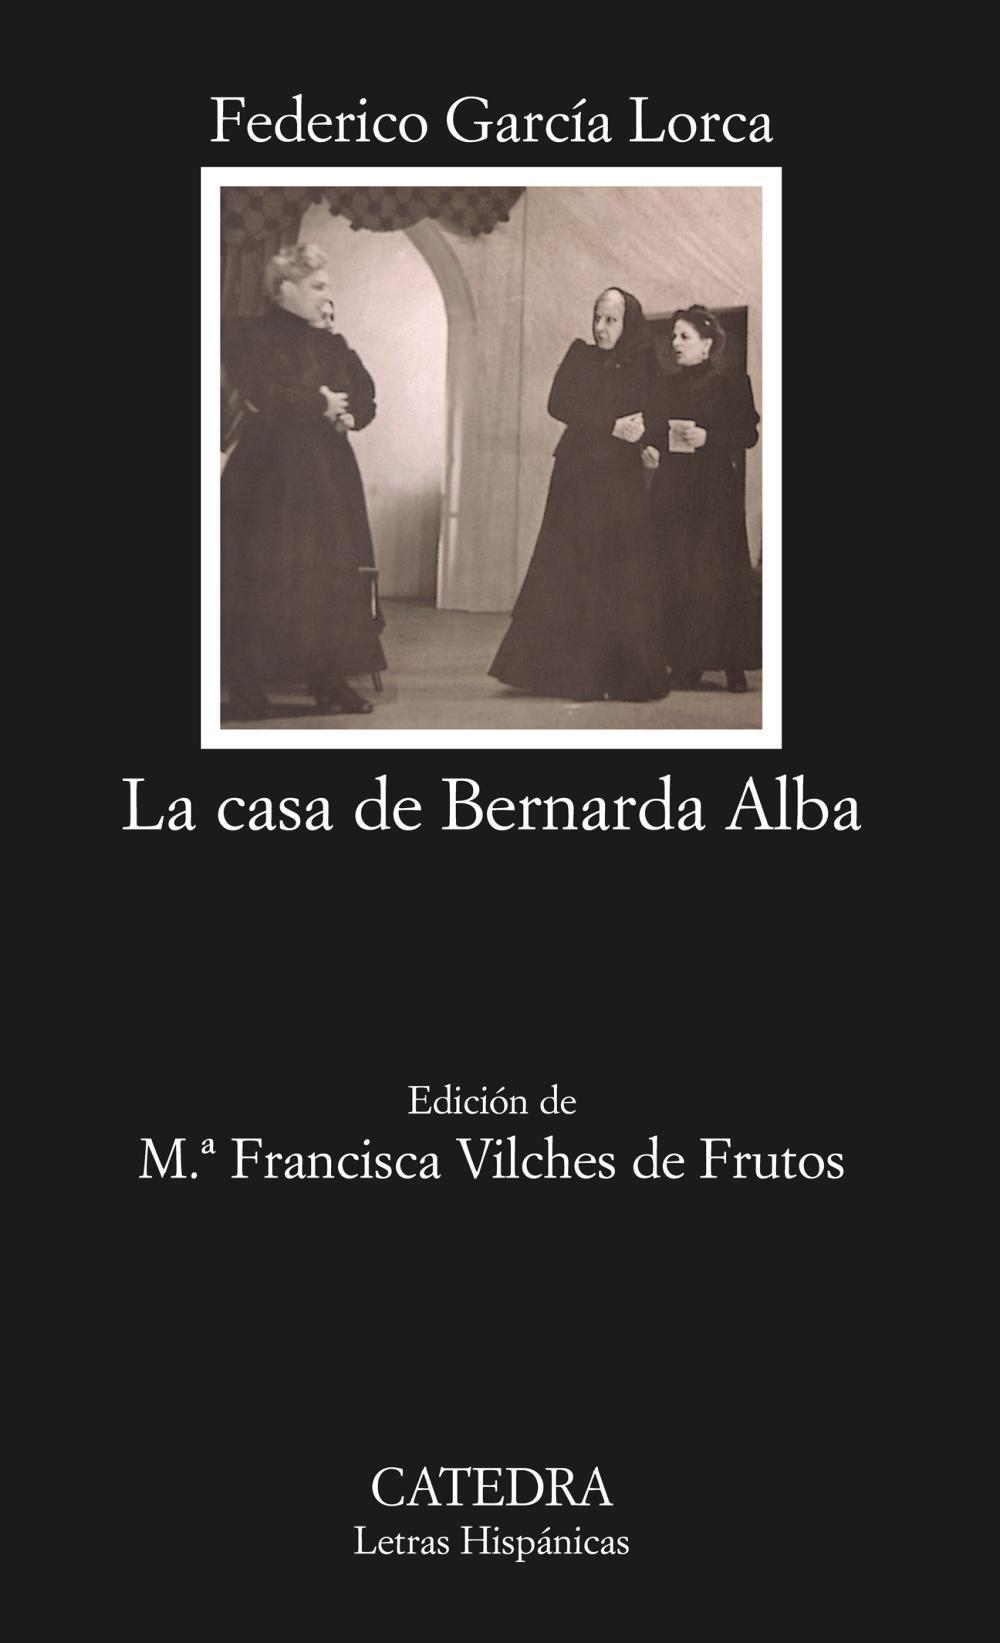 TERTULIA LITERARIA: LA CASA DE BERNARDA ALBA